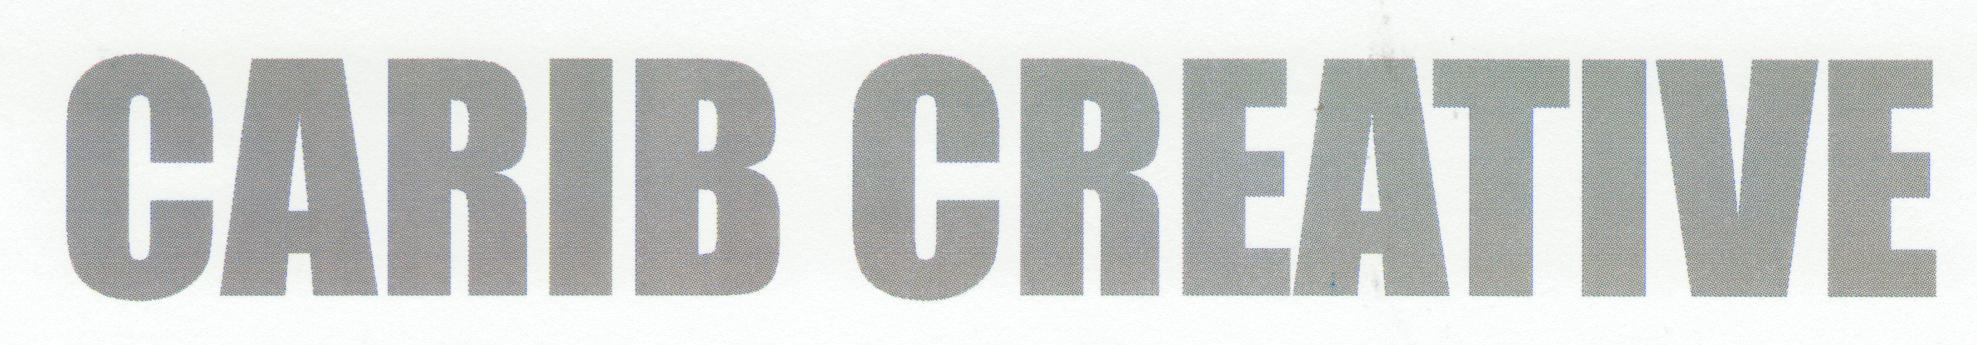 Carib Creative Logo Scan-page-001